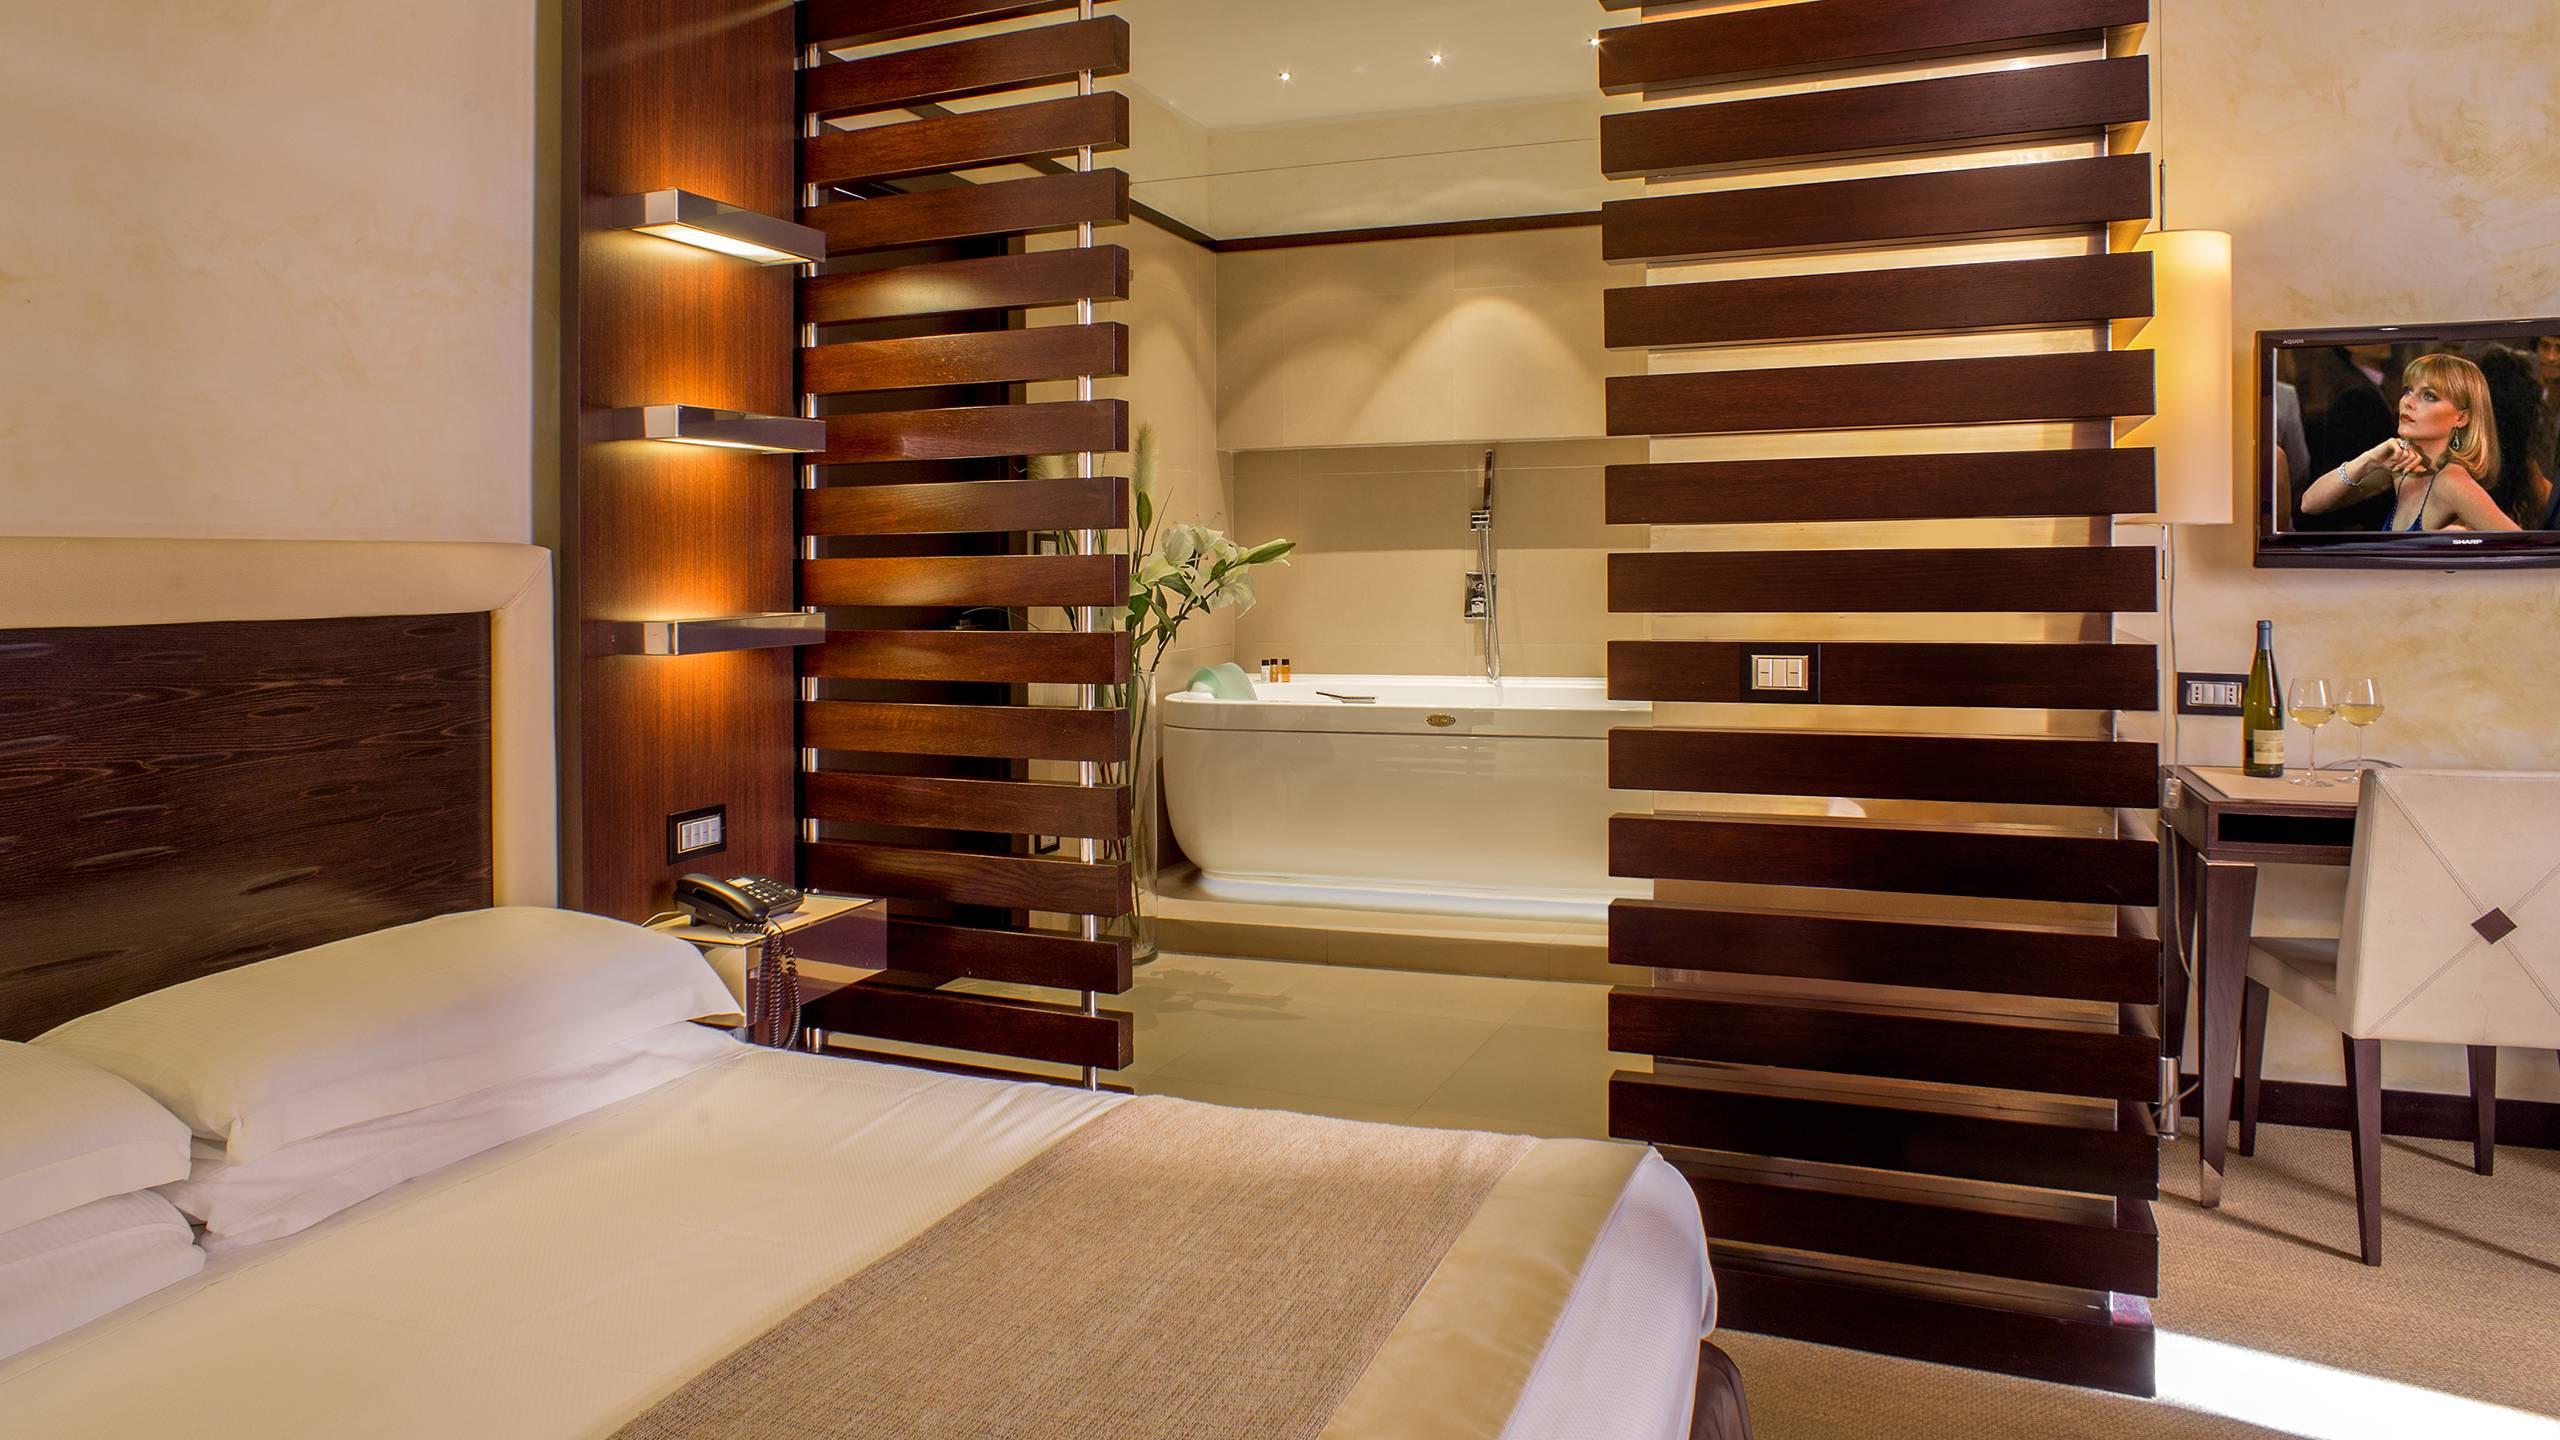 06-Les-Fleurs-Luxury-House-Rome-room